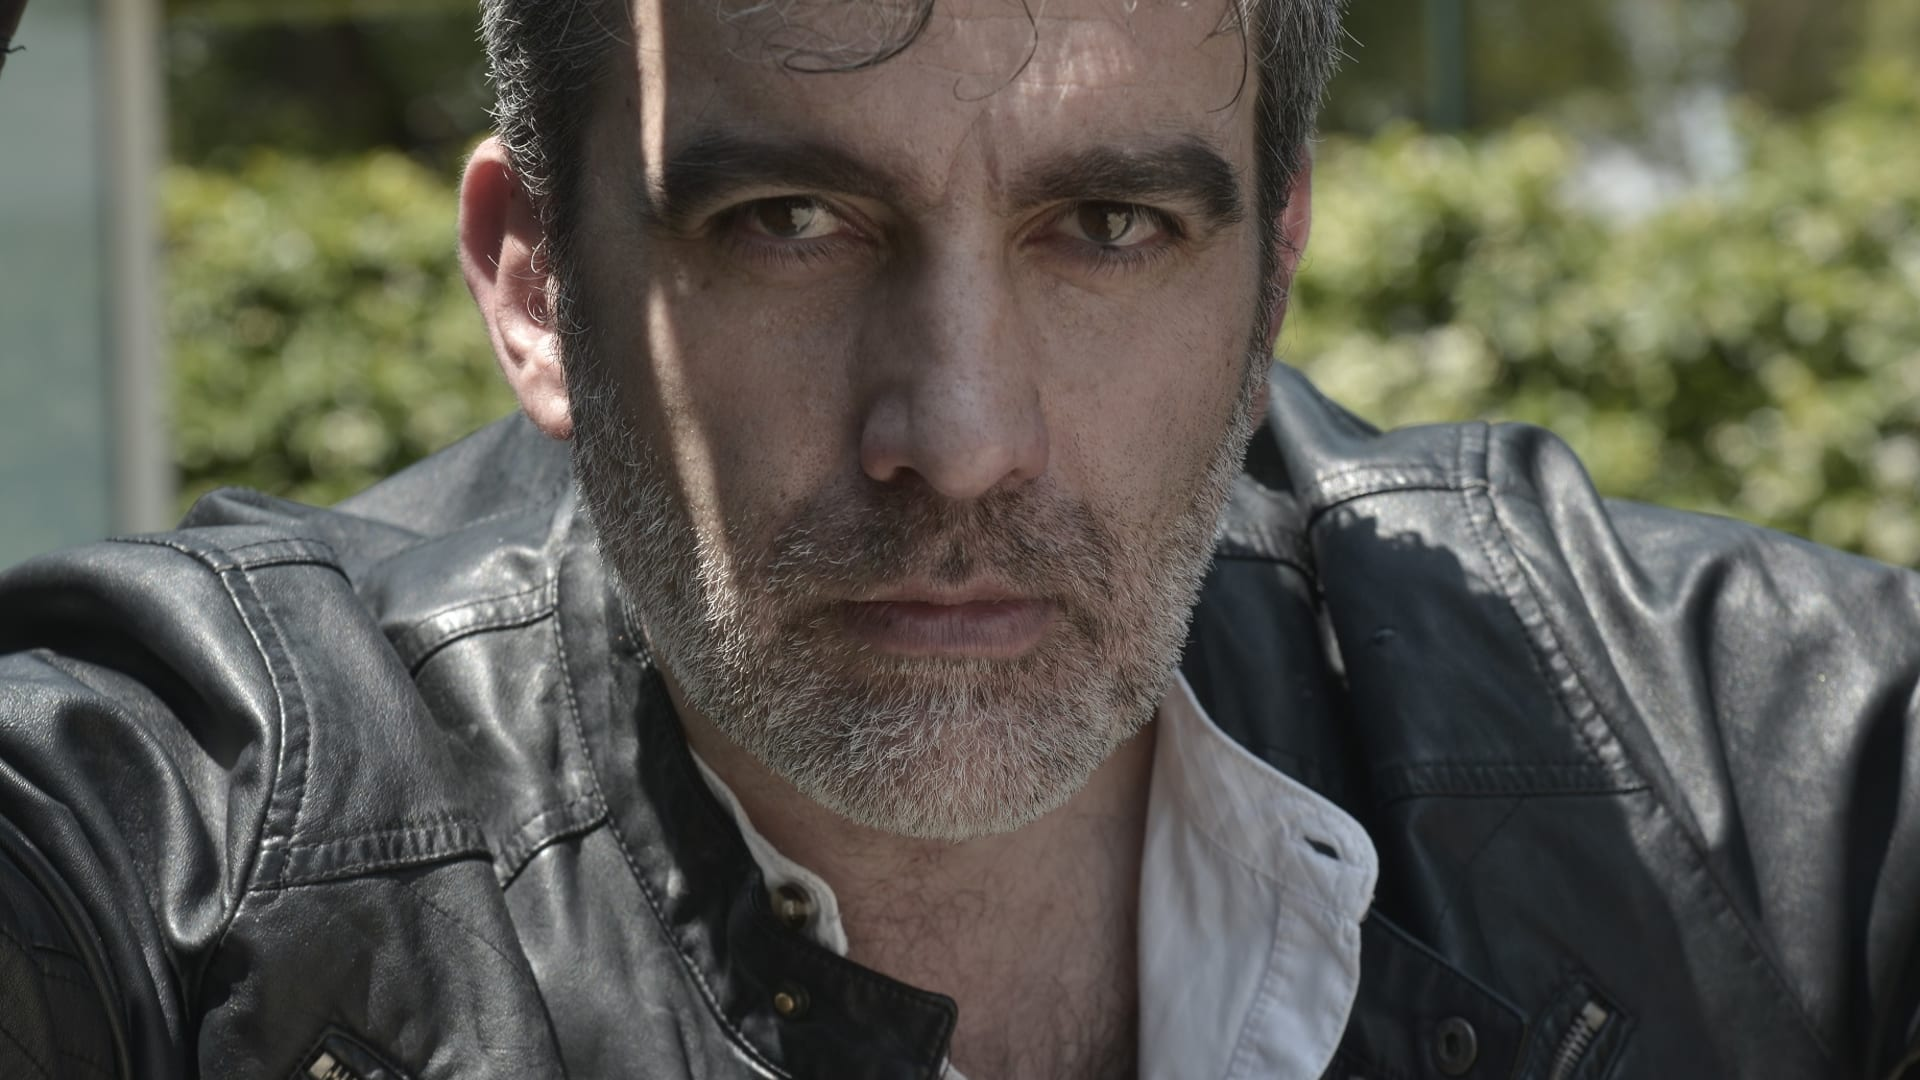 Giovanni Leuratti